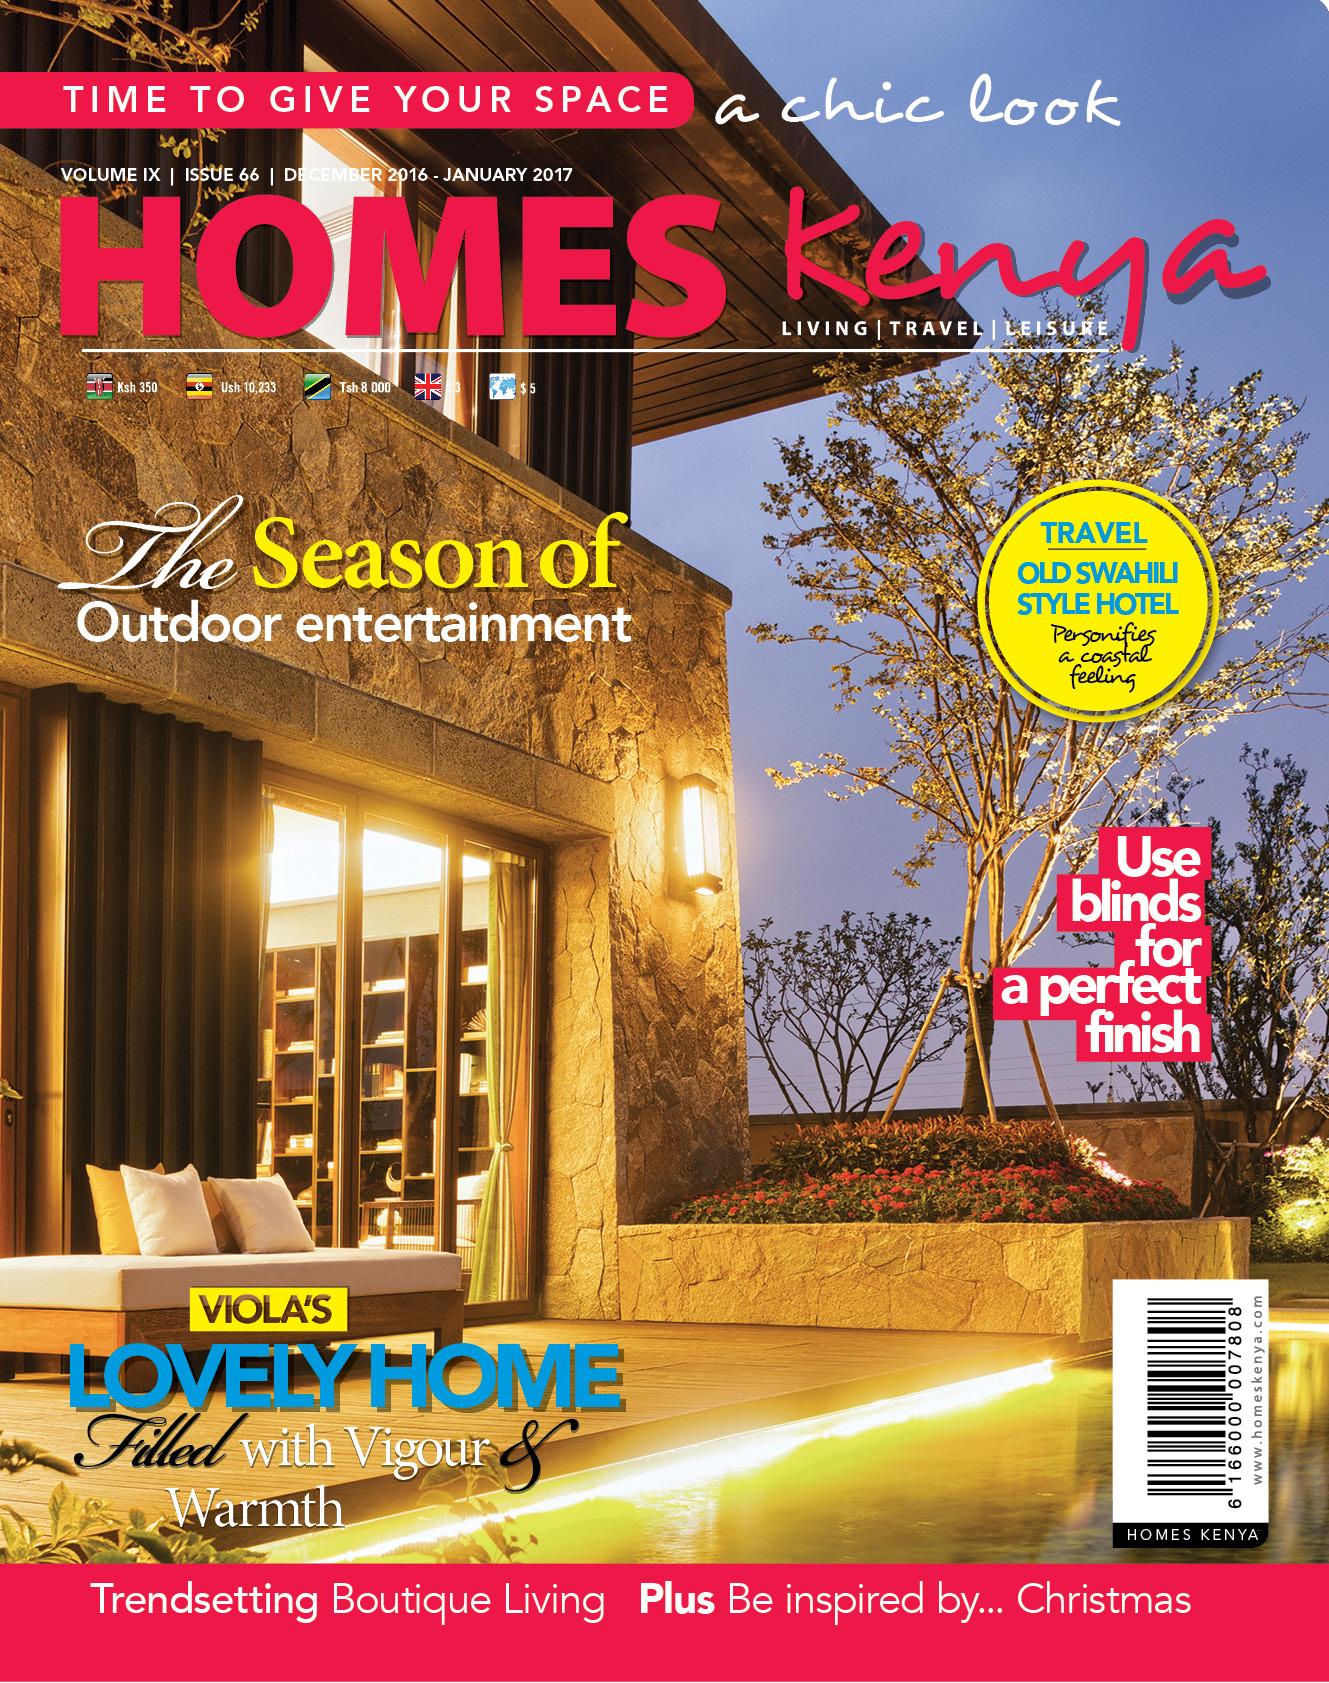 Homes Kenya Dec Jan front cover Maisha inspiration.jpg